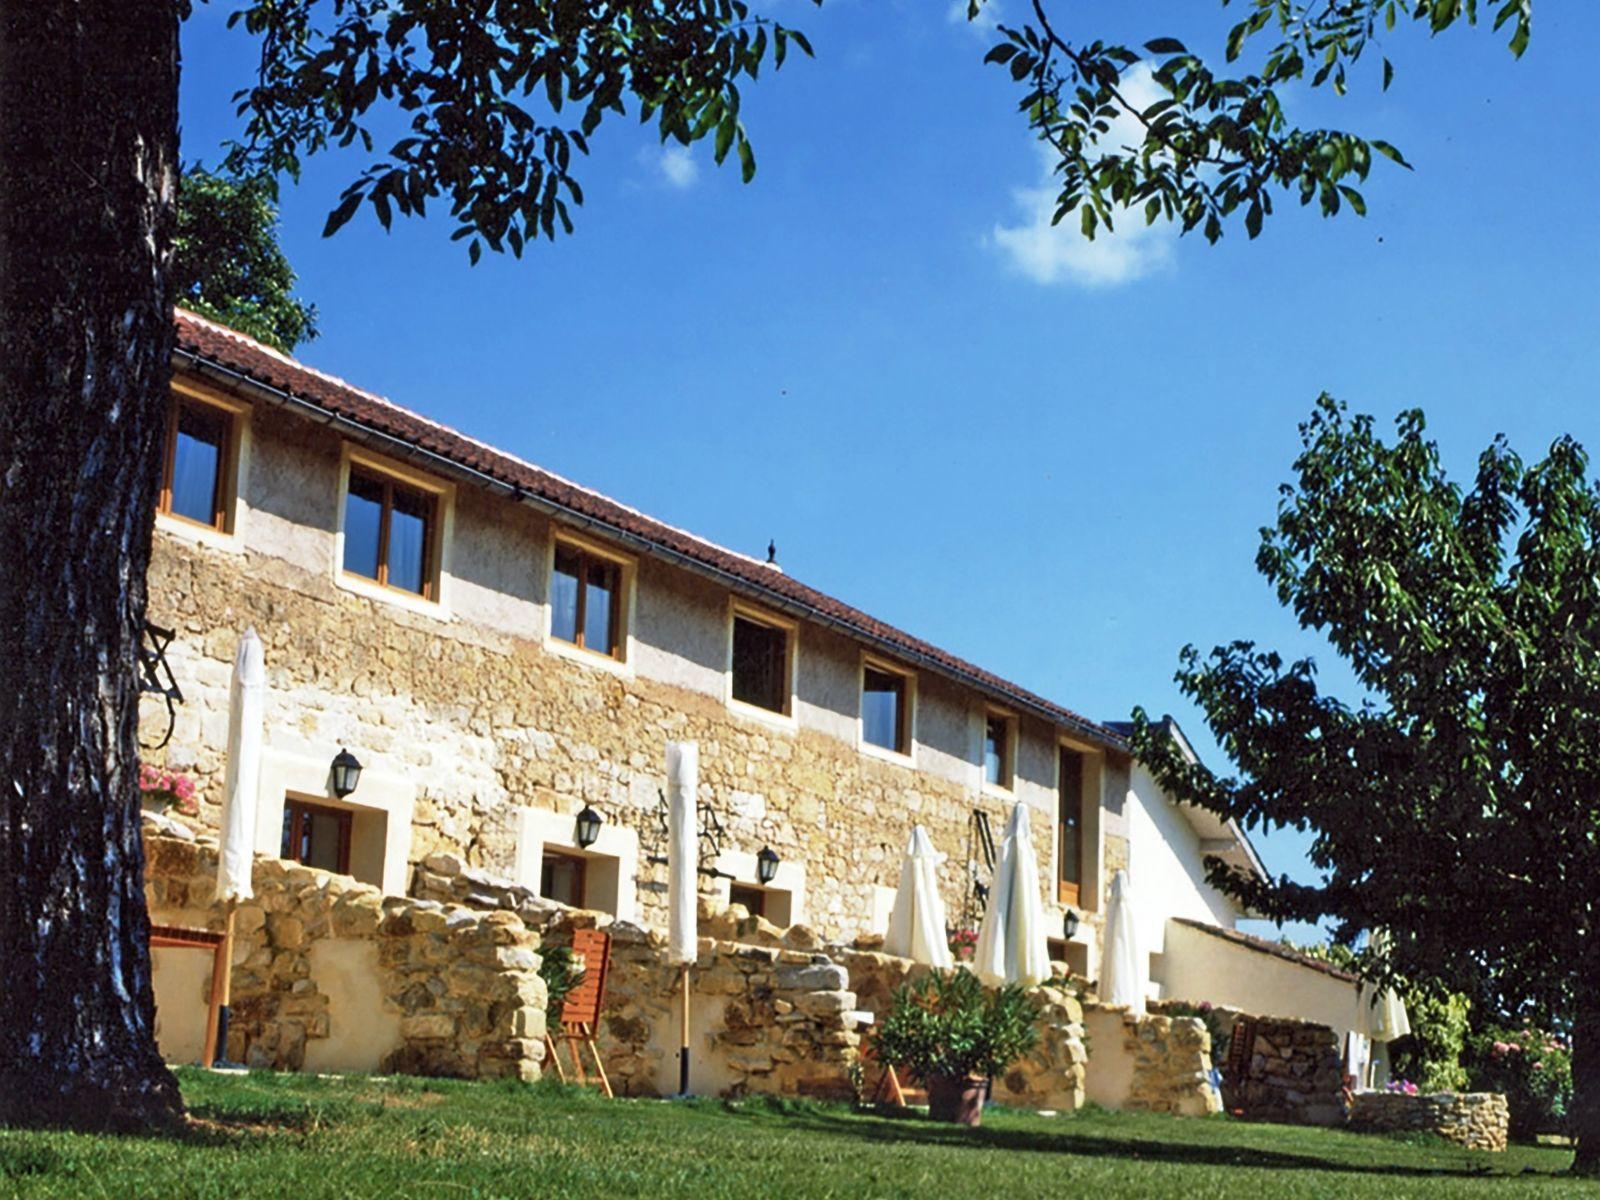 Chateau Prayssac - C vakantiehuis met zwembad